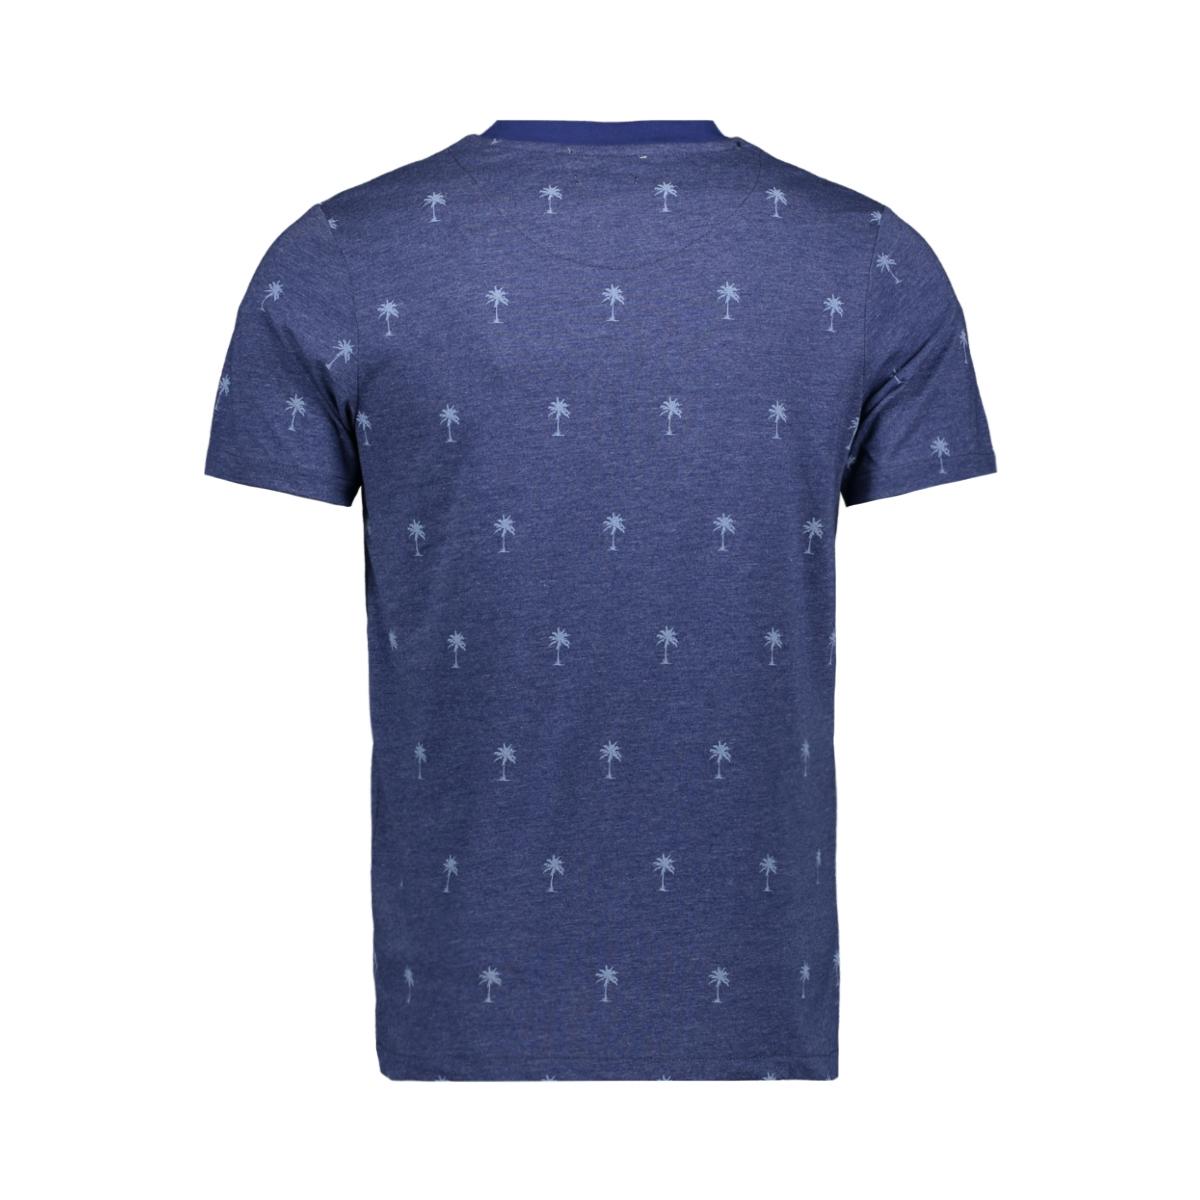 jprsean tee ss crew neck exp sc 12152785 jack & jones t-shirt blue depths